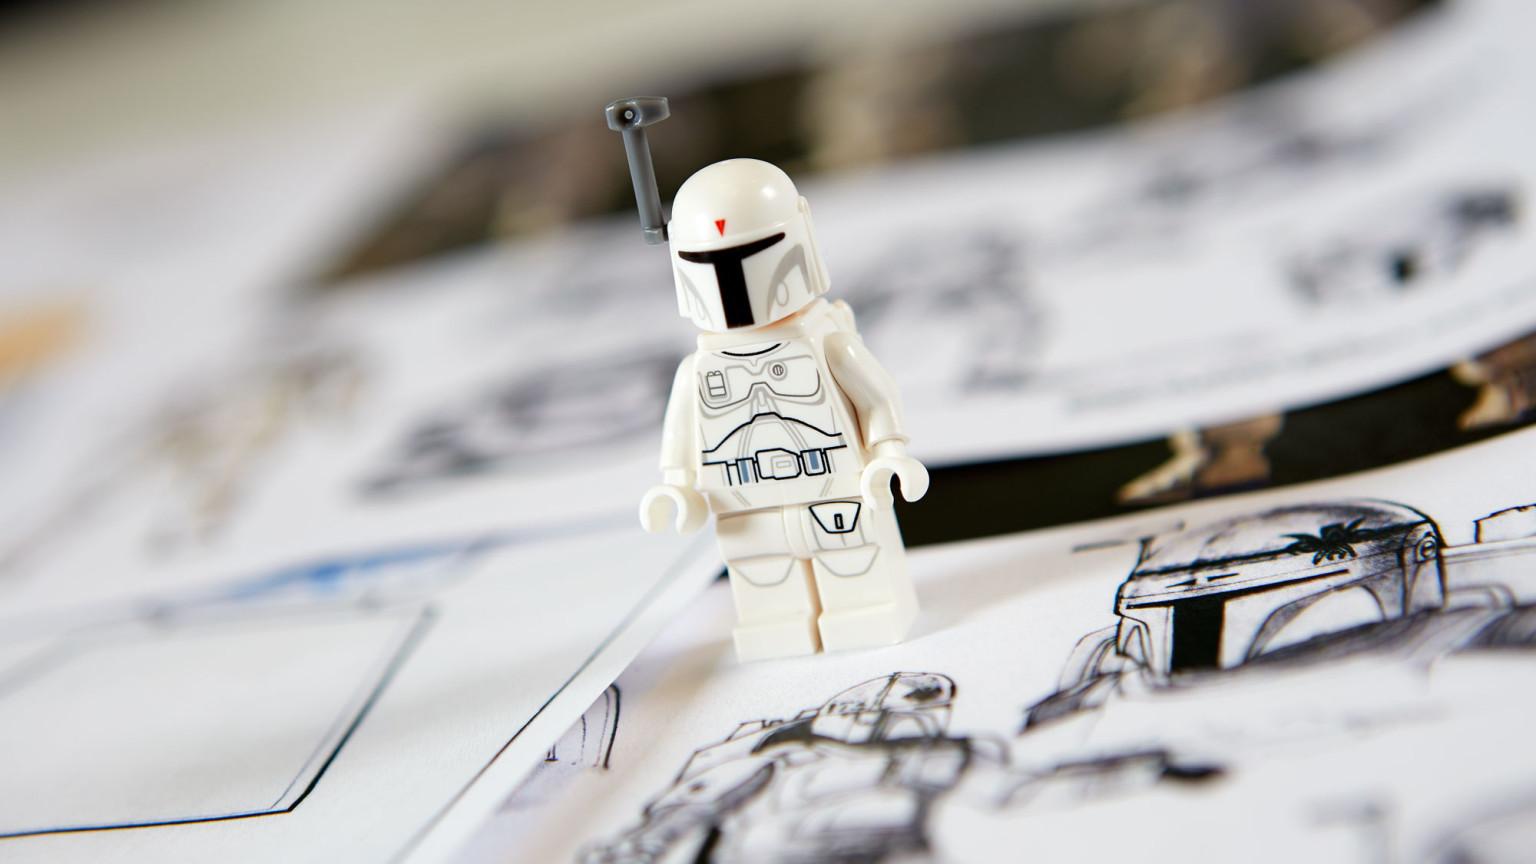 Lego Star Wars enciclopedia de personajes ampliada, Minifigura